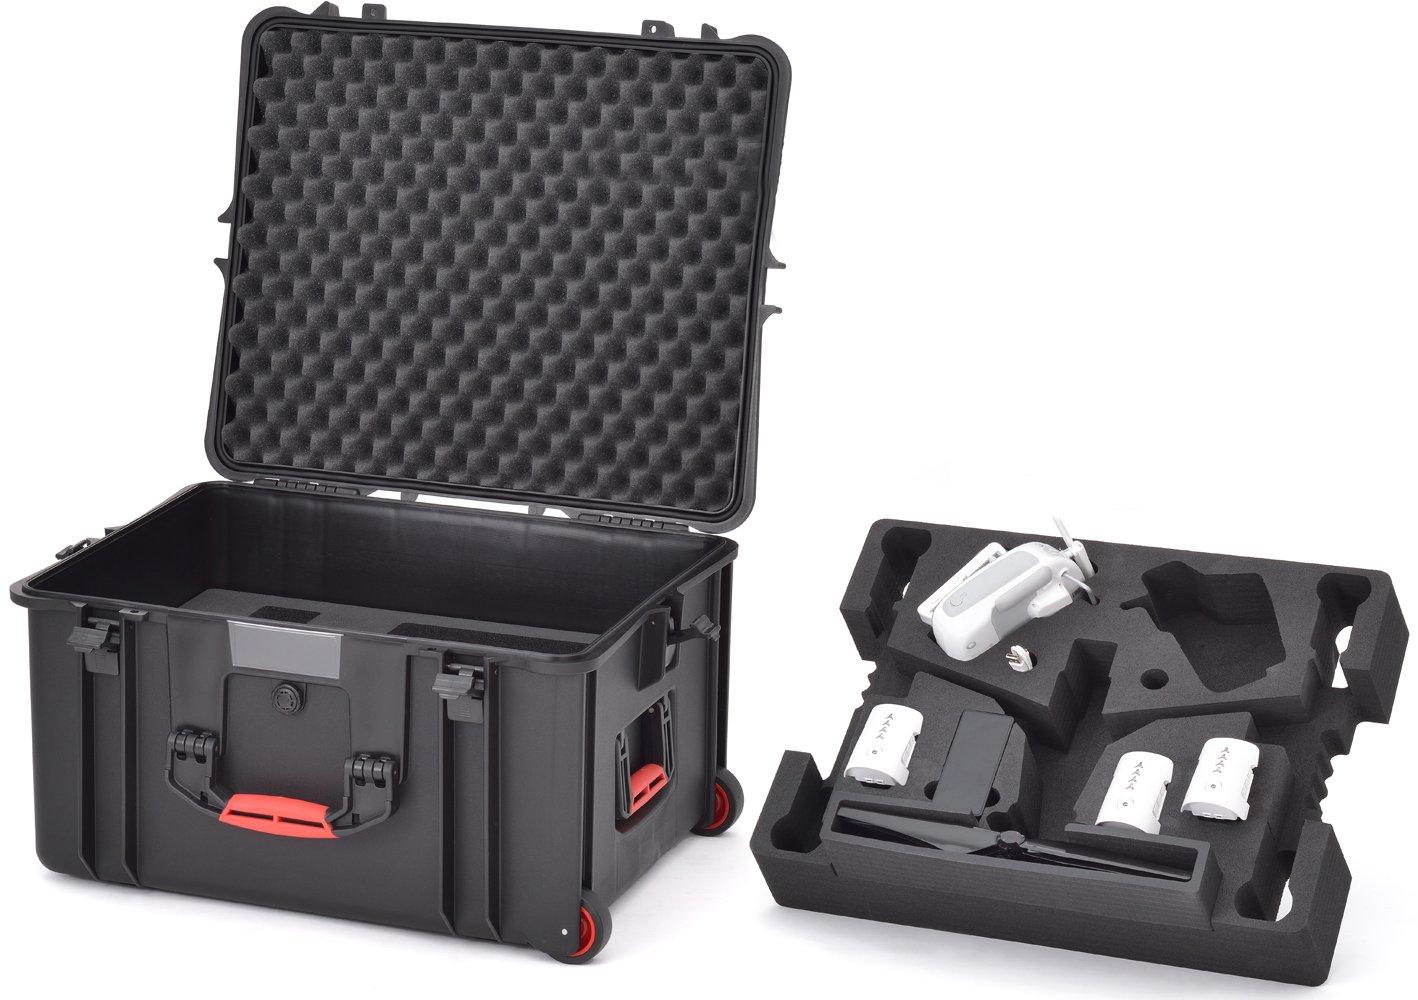 HPRC HPRC2730WINSPRO Wheeled Hard Case for DJI Inspire 1/ Pro (Black)